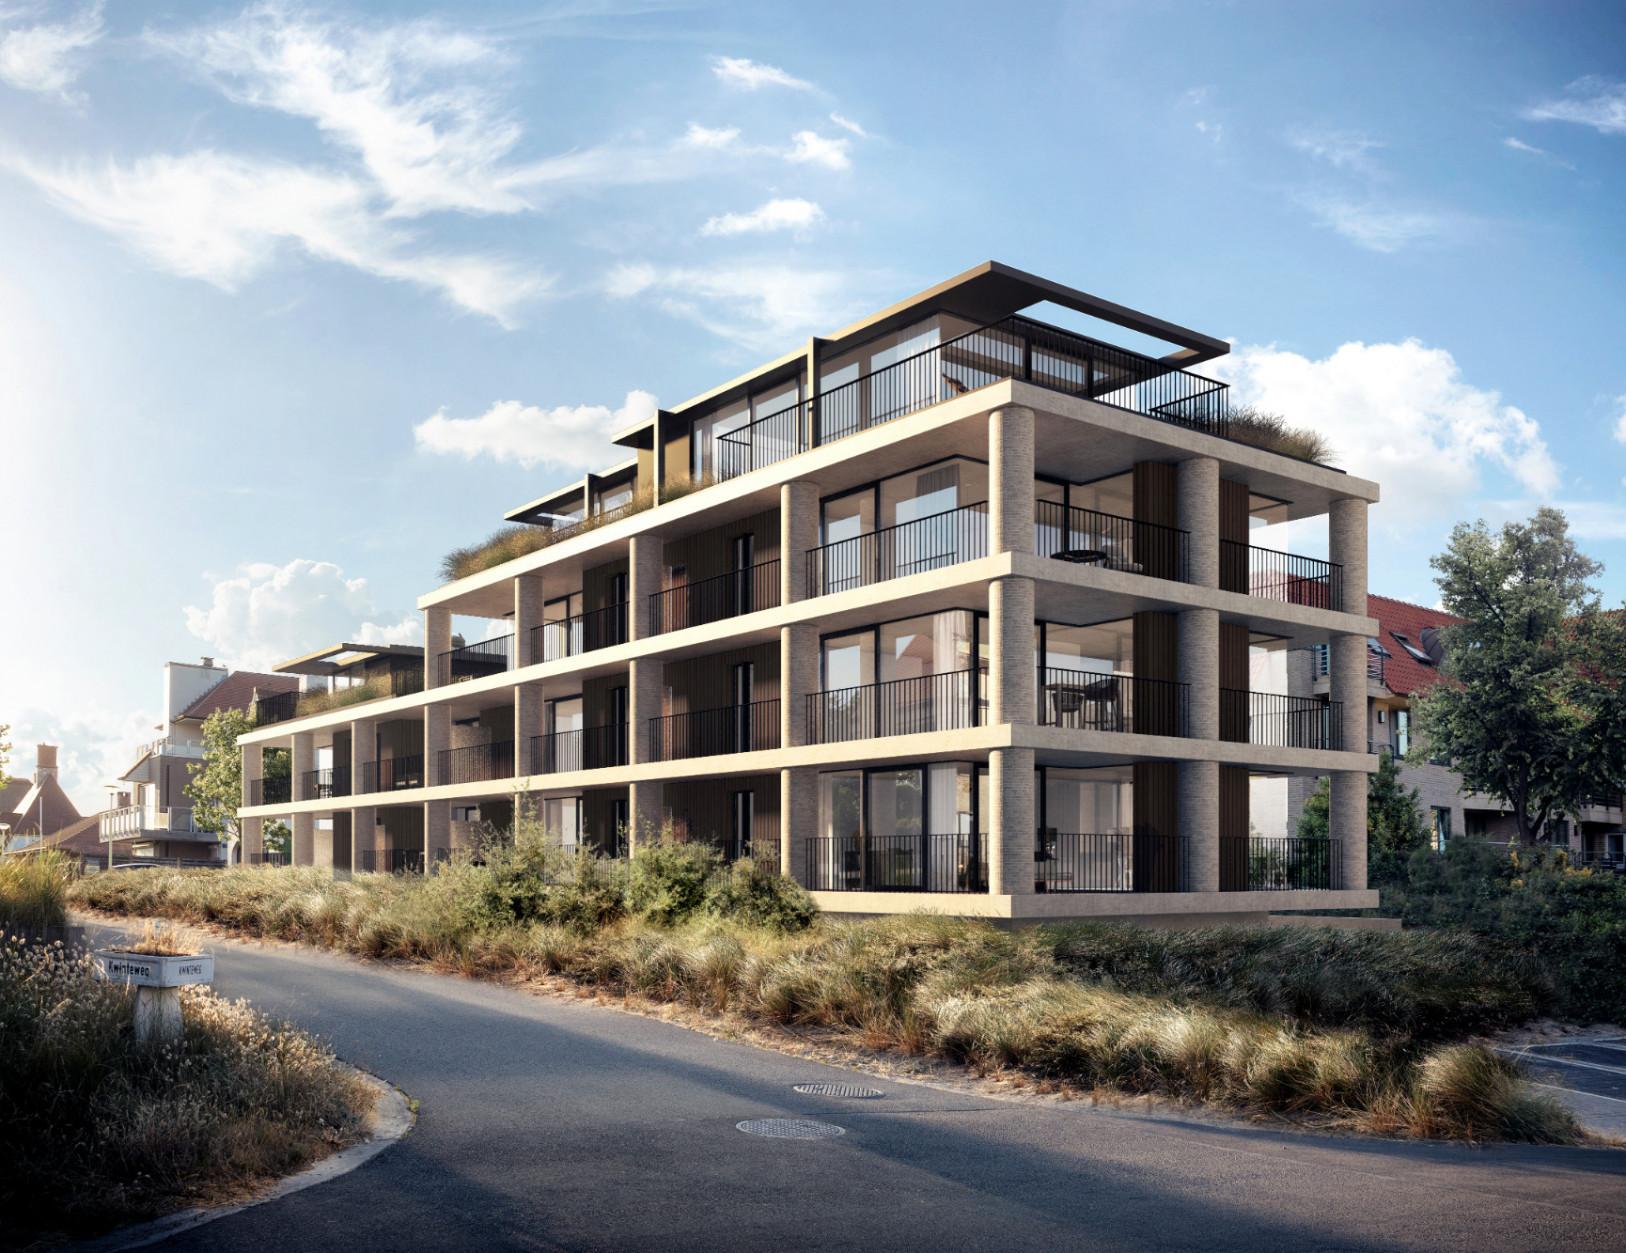 Theo van Doesburg - Oostduinkerke - Te koop - Rietveldprojects - Caan Architecten4.jpg